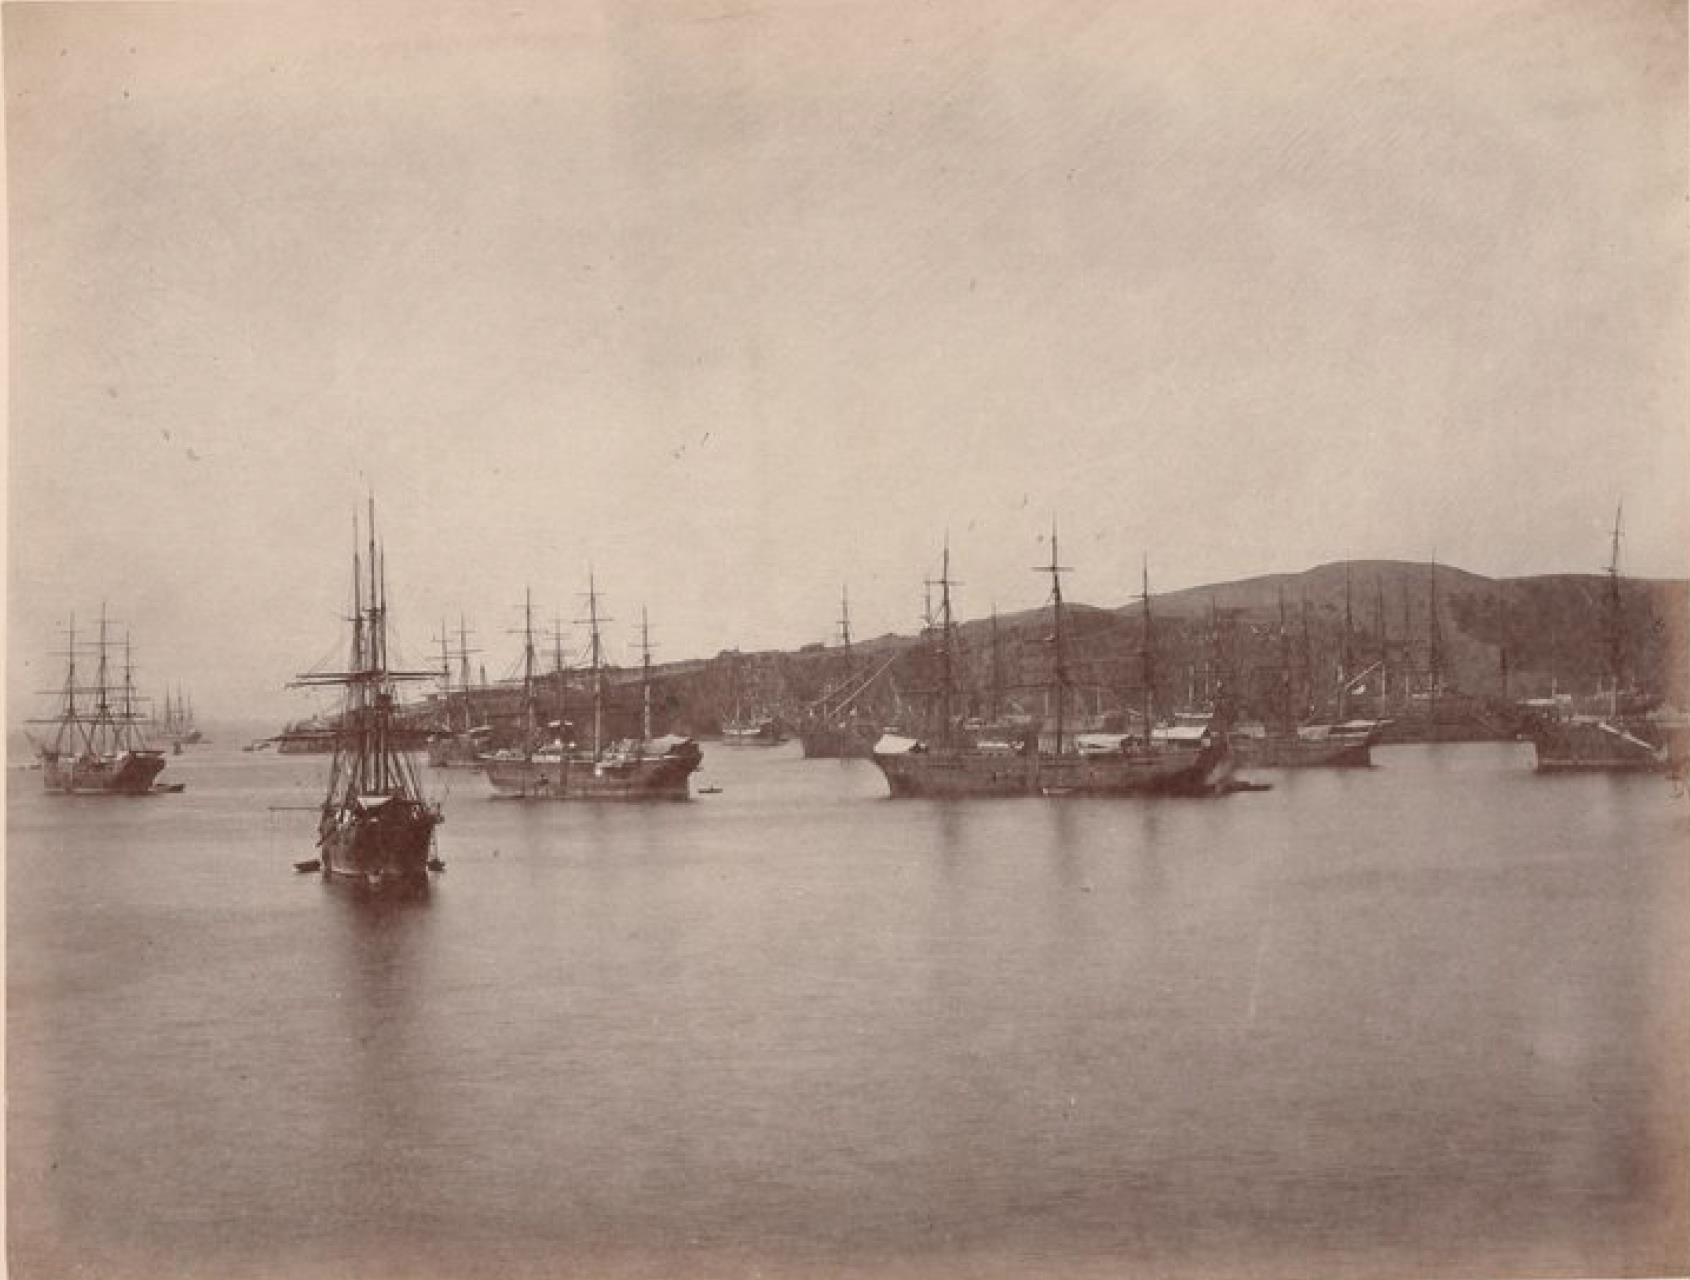 Острова Чинча. Панорама Среднего Чинча. Корабли, ожидающие груза гуано